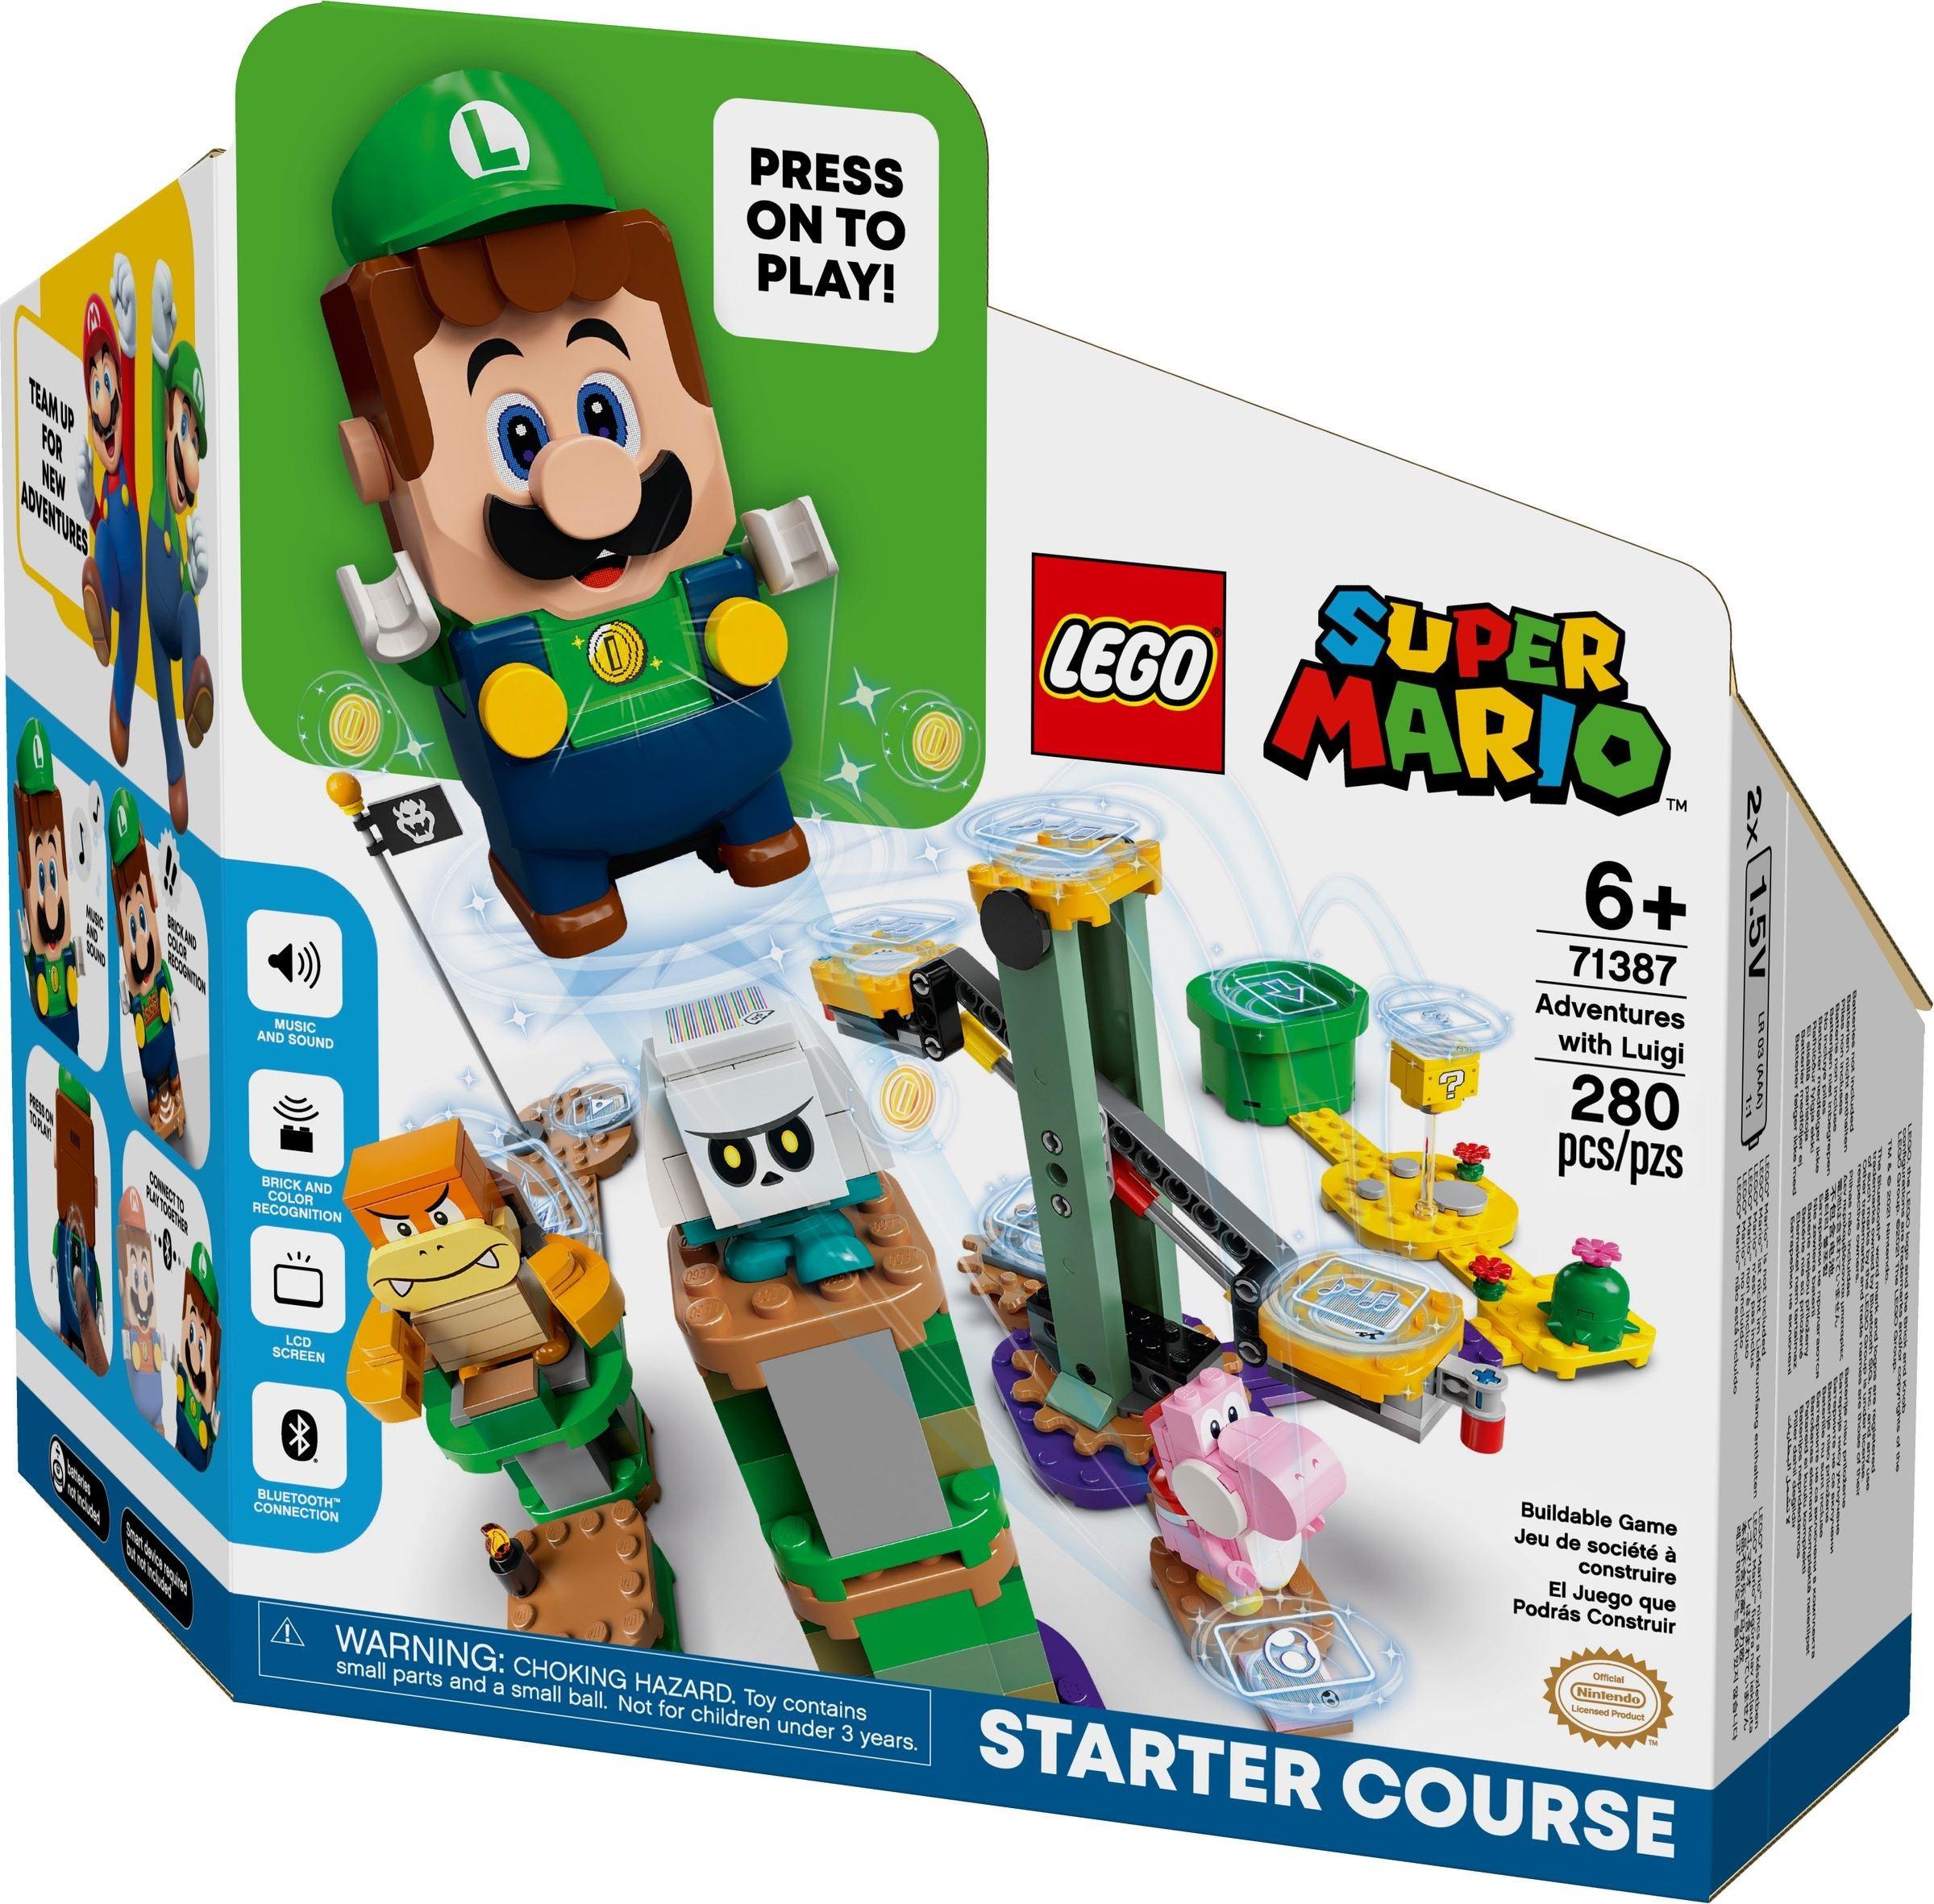 71387 LEGO Super Mario Adventures with Luigi - Cuộc phiêu lưu cùng Luigi